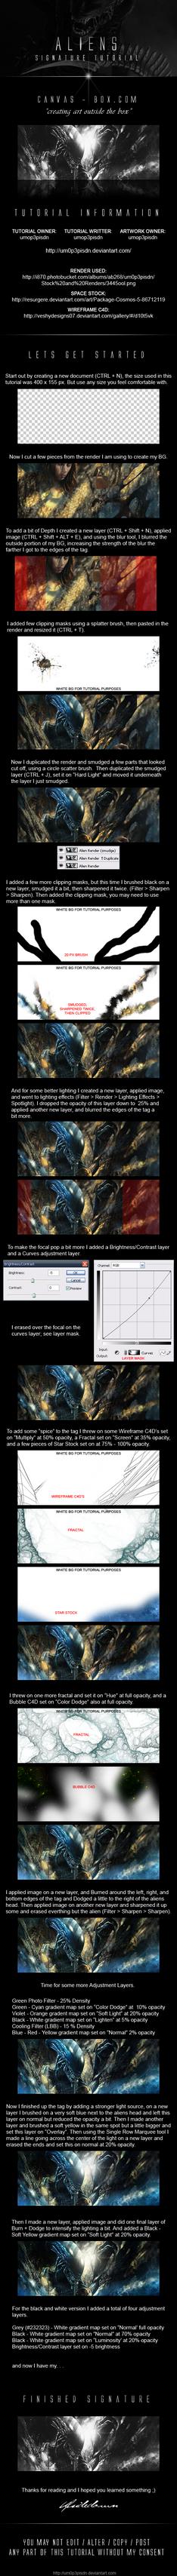 A  L  I  E  N  S  tutorial by um0p3pisdn